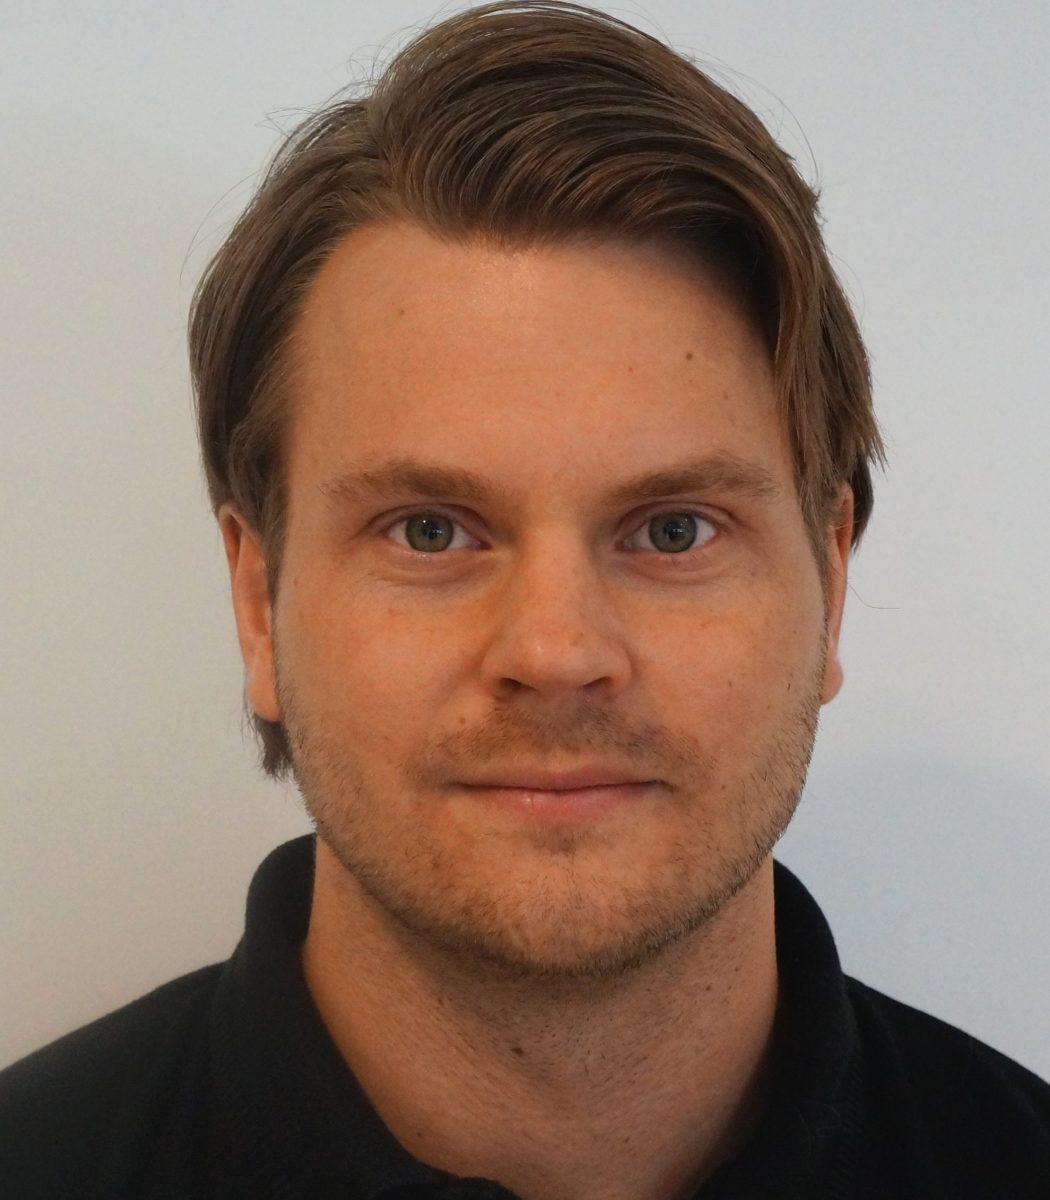 Niclas Johansson